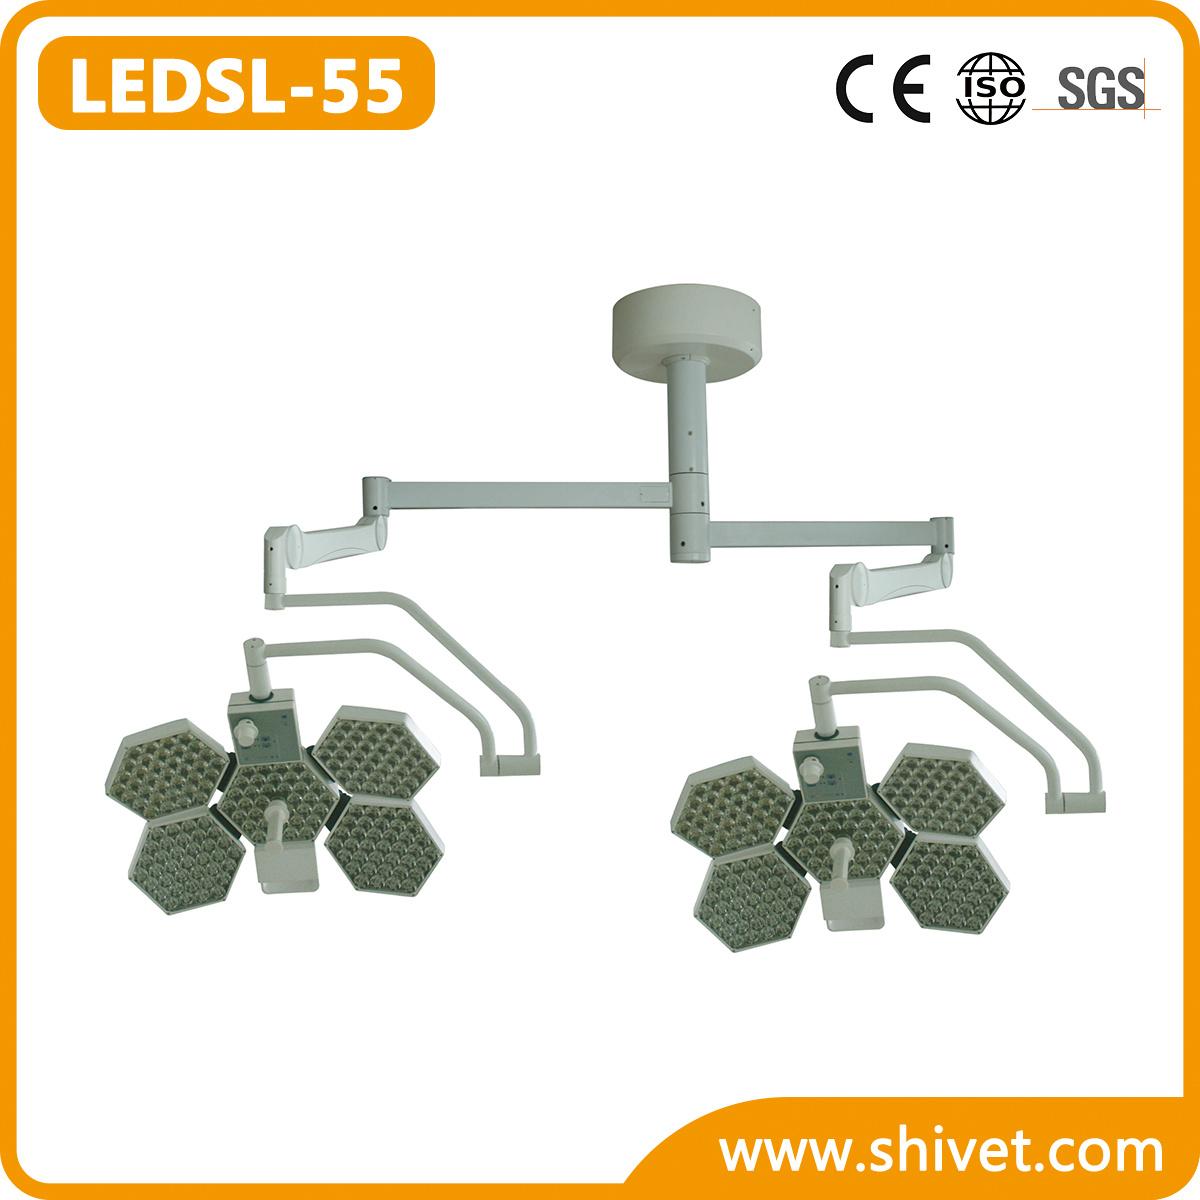 Veterinary Shadowless Operating Lamp (LEDSL-55)